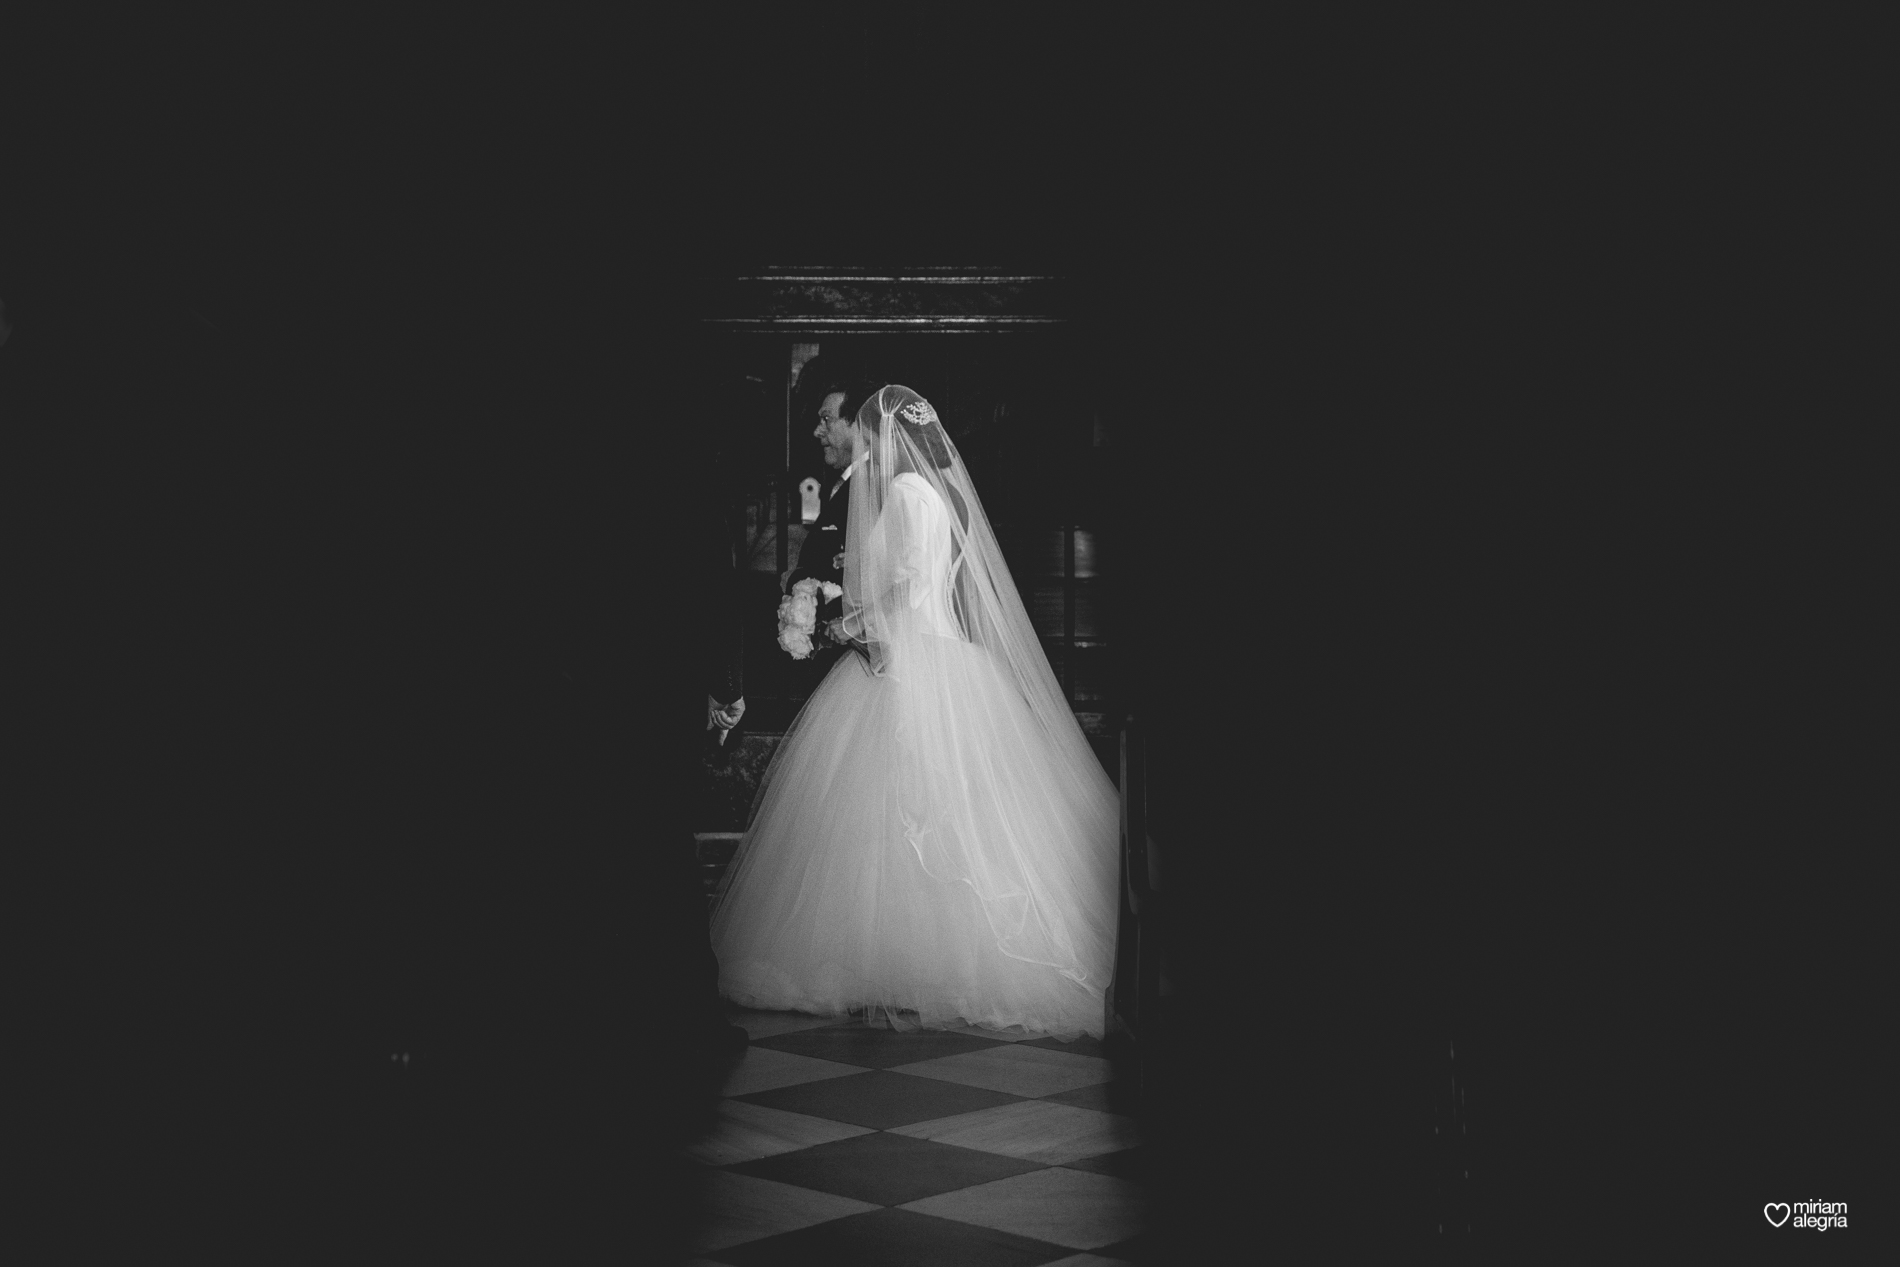 boda-en-la-catedral-de-murcia-miriam-alegria-fotografos-boda-murcia-34